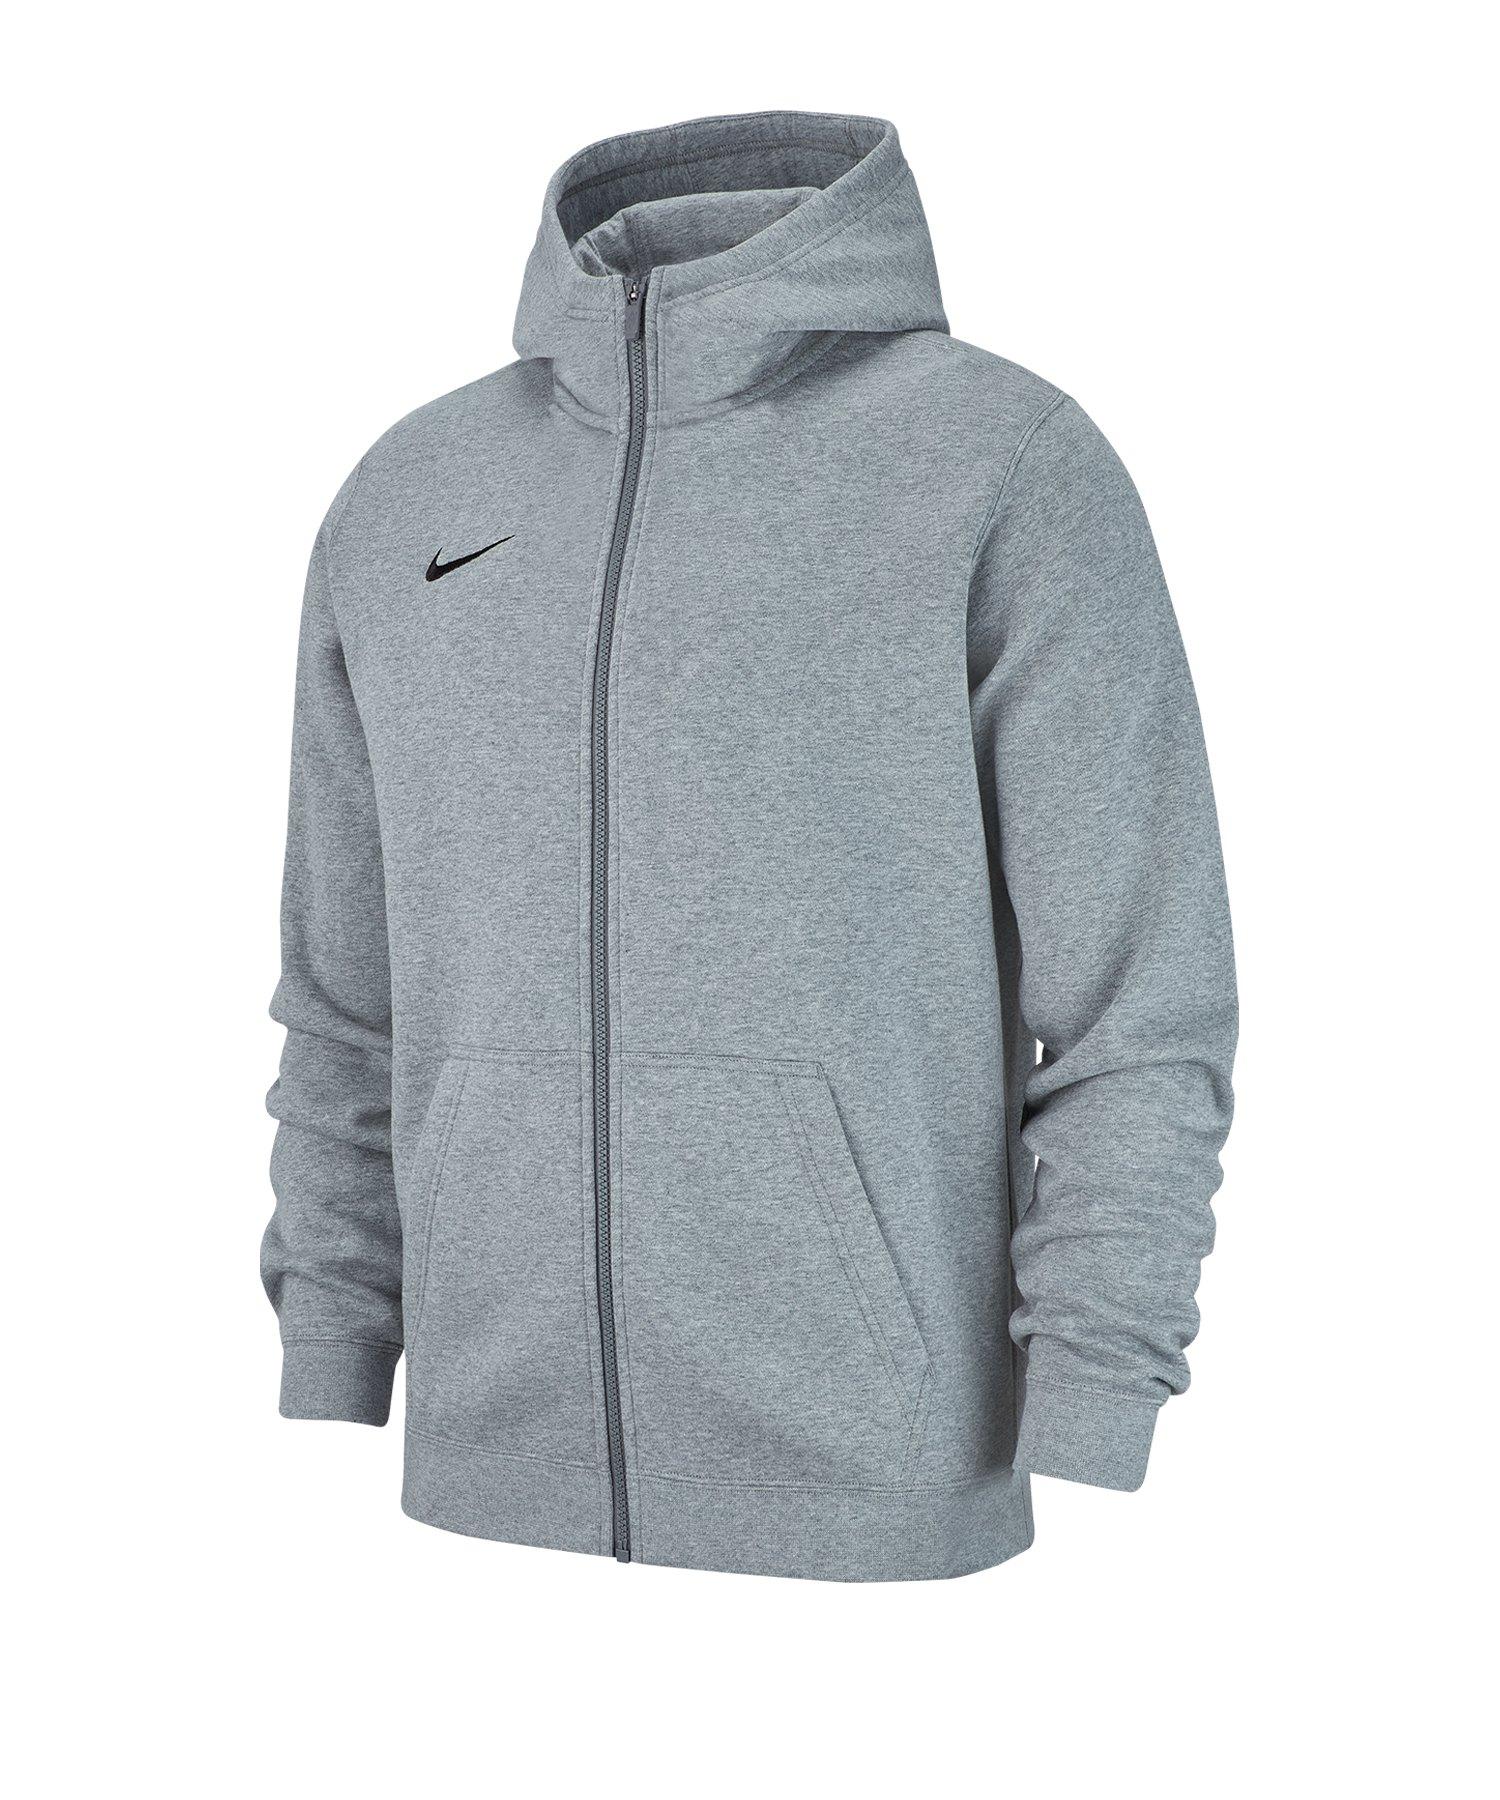 nike pullover günstig, Nike Rom 1516 Heim Fußballtrikot